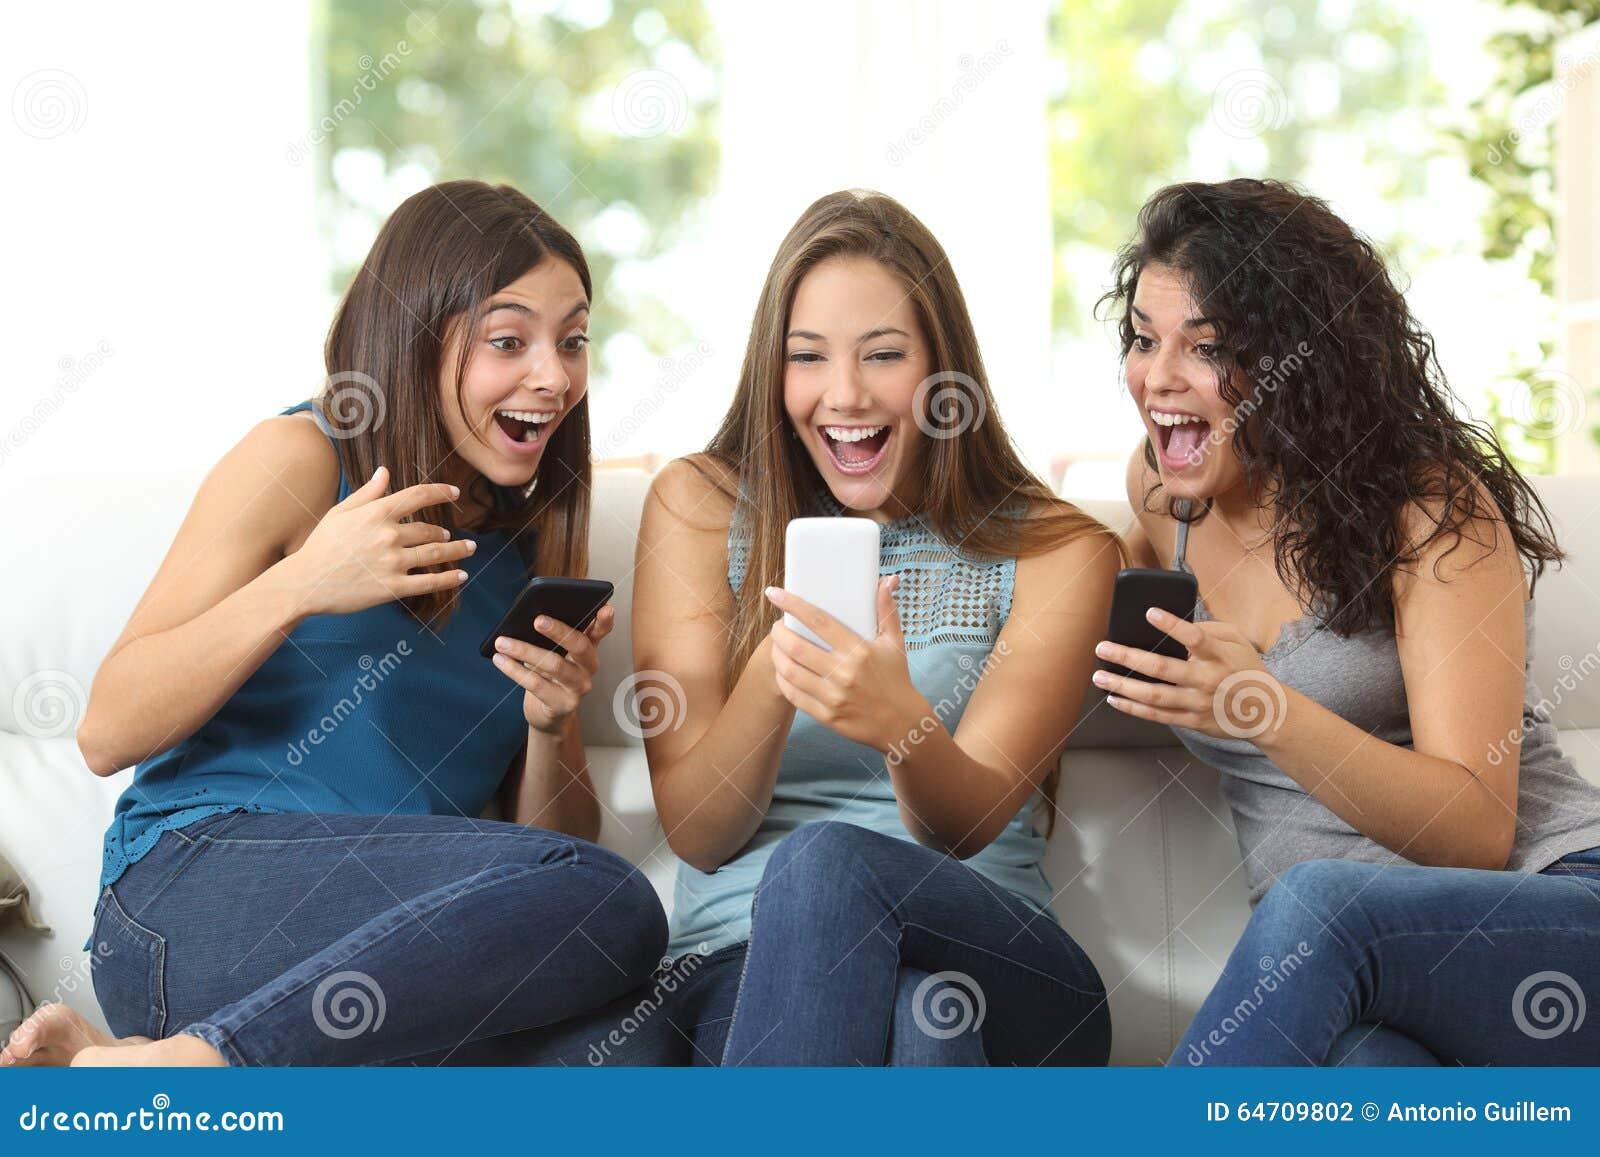 Tres amigos sorprendentes mirando un teléfono elegante